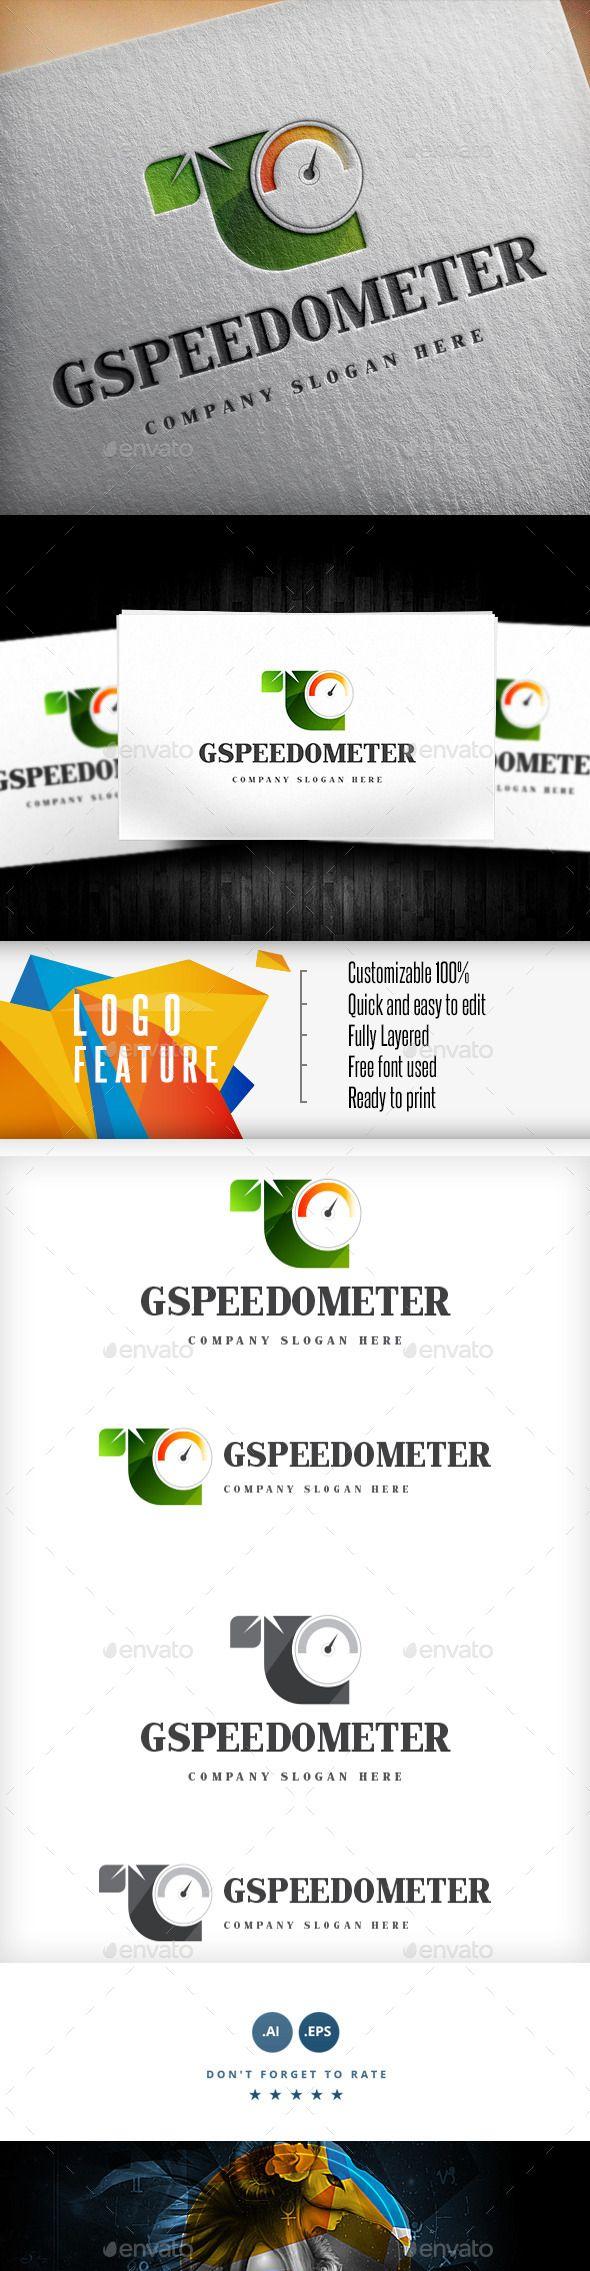 Green Speedometer Logo